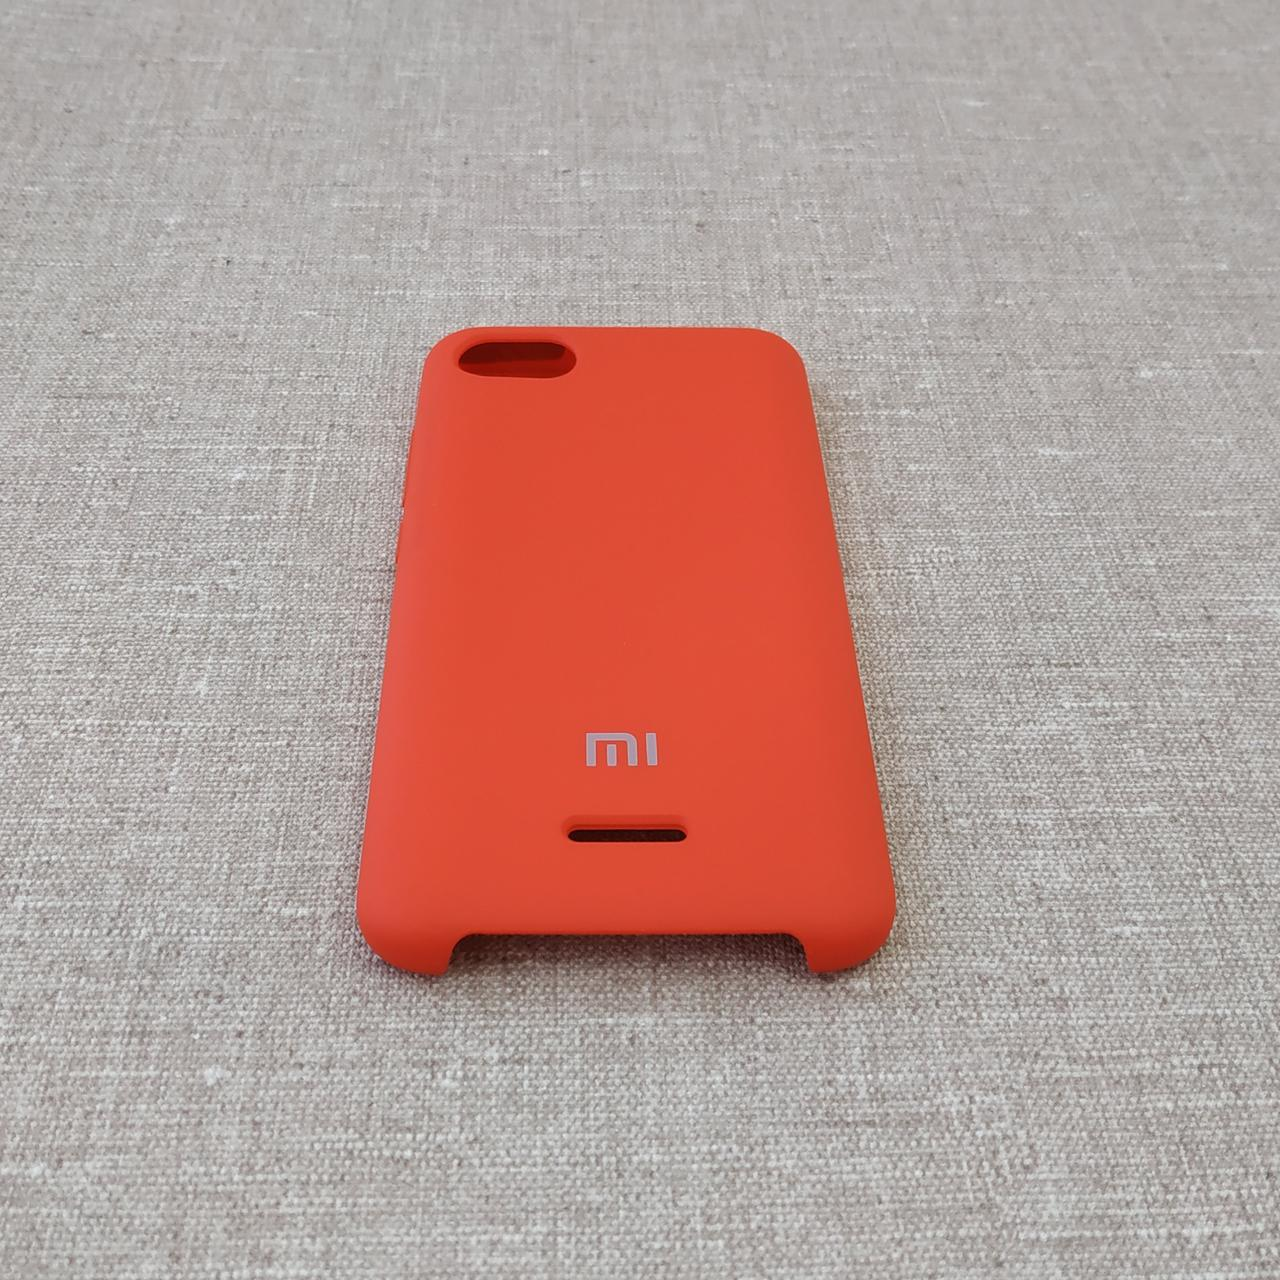 Чехлы для Xiaomi Redmi 6A Original Soft 6a red